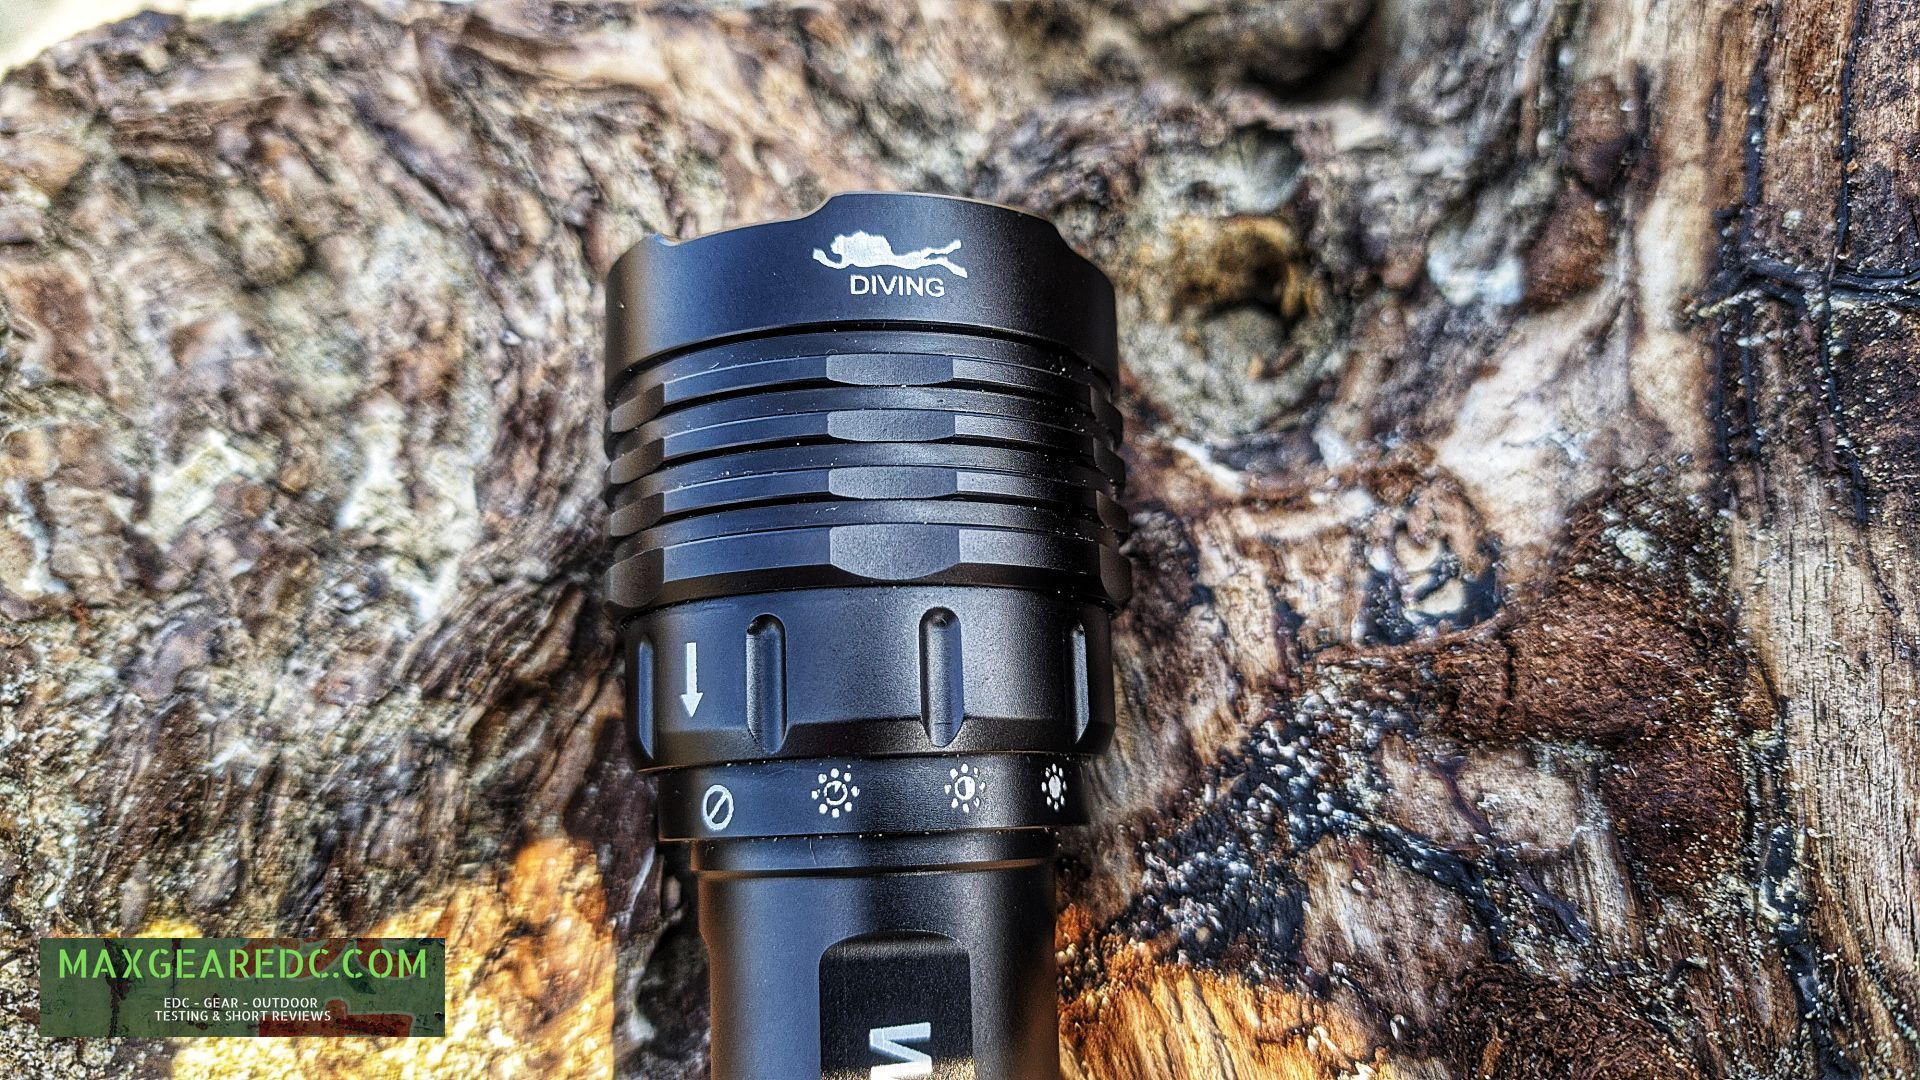 Wurkkos_DL30_Diving_Flashlight_Review_Aluminium_21700_maxgearedc.com_EDC_GEAR_OUTDOOR_TESTING_and_SHORT_REVIEWS_7